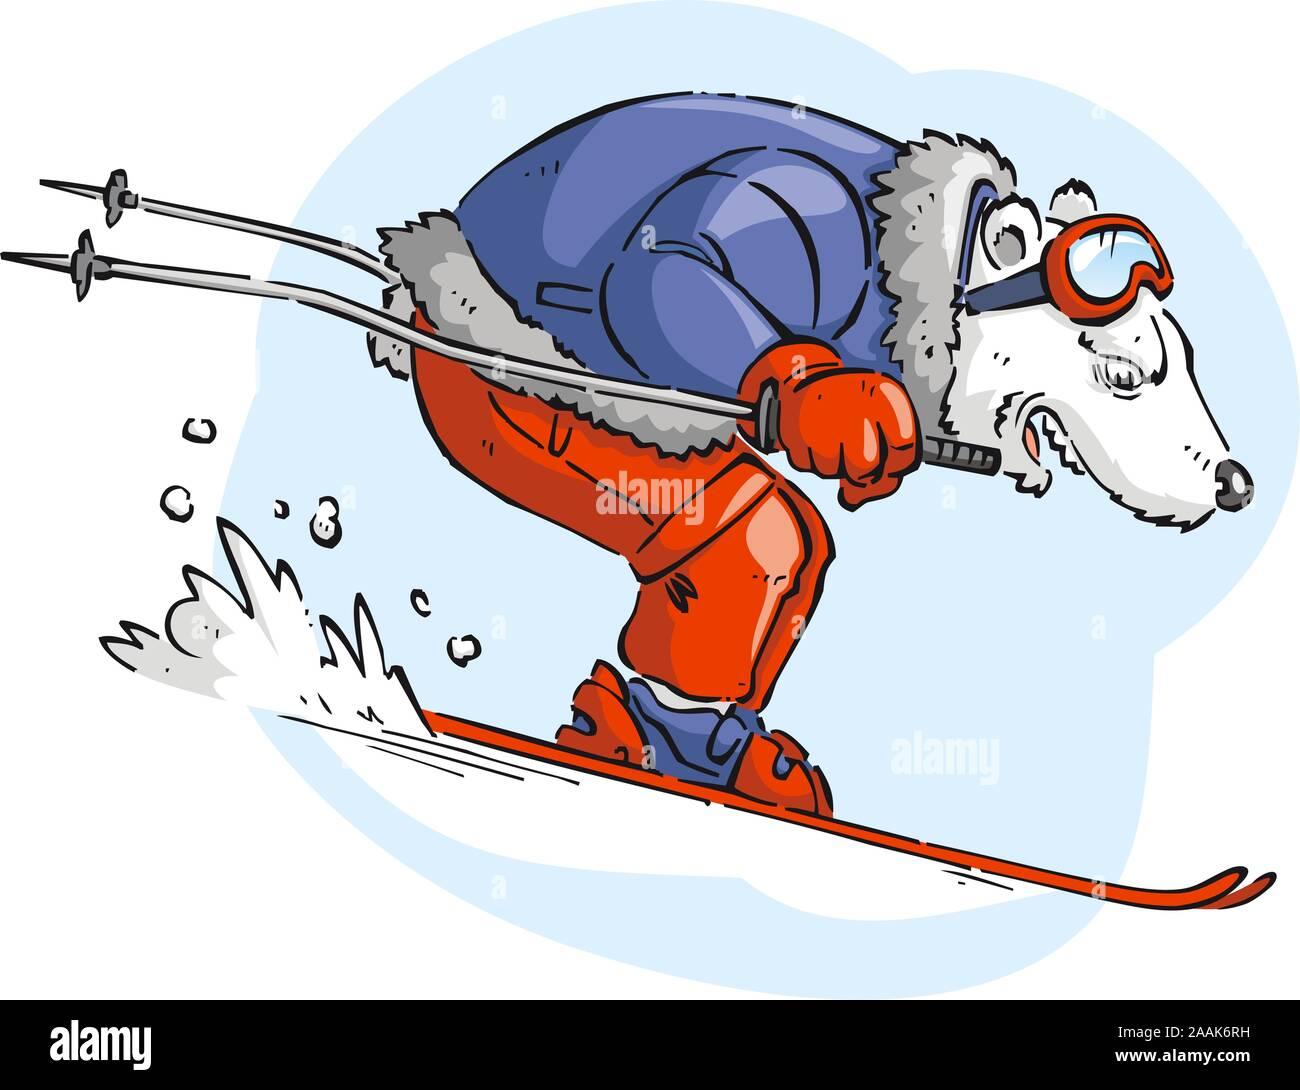 Polar bar skiing with blue jacket and red pants snow vector cartoon. Stock Vector